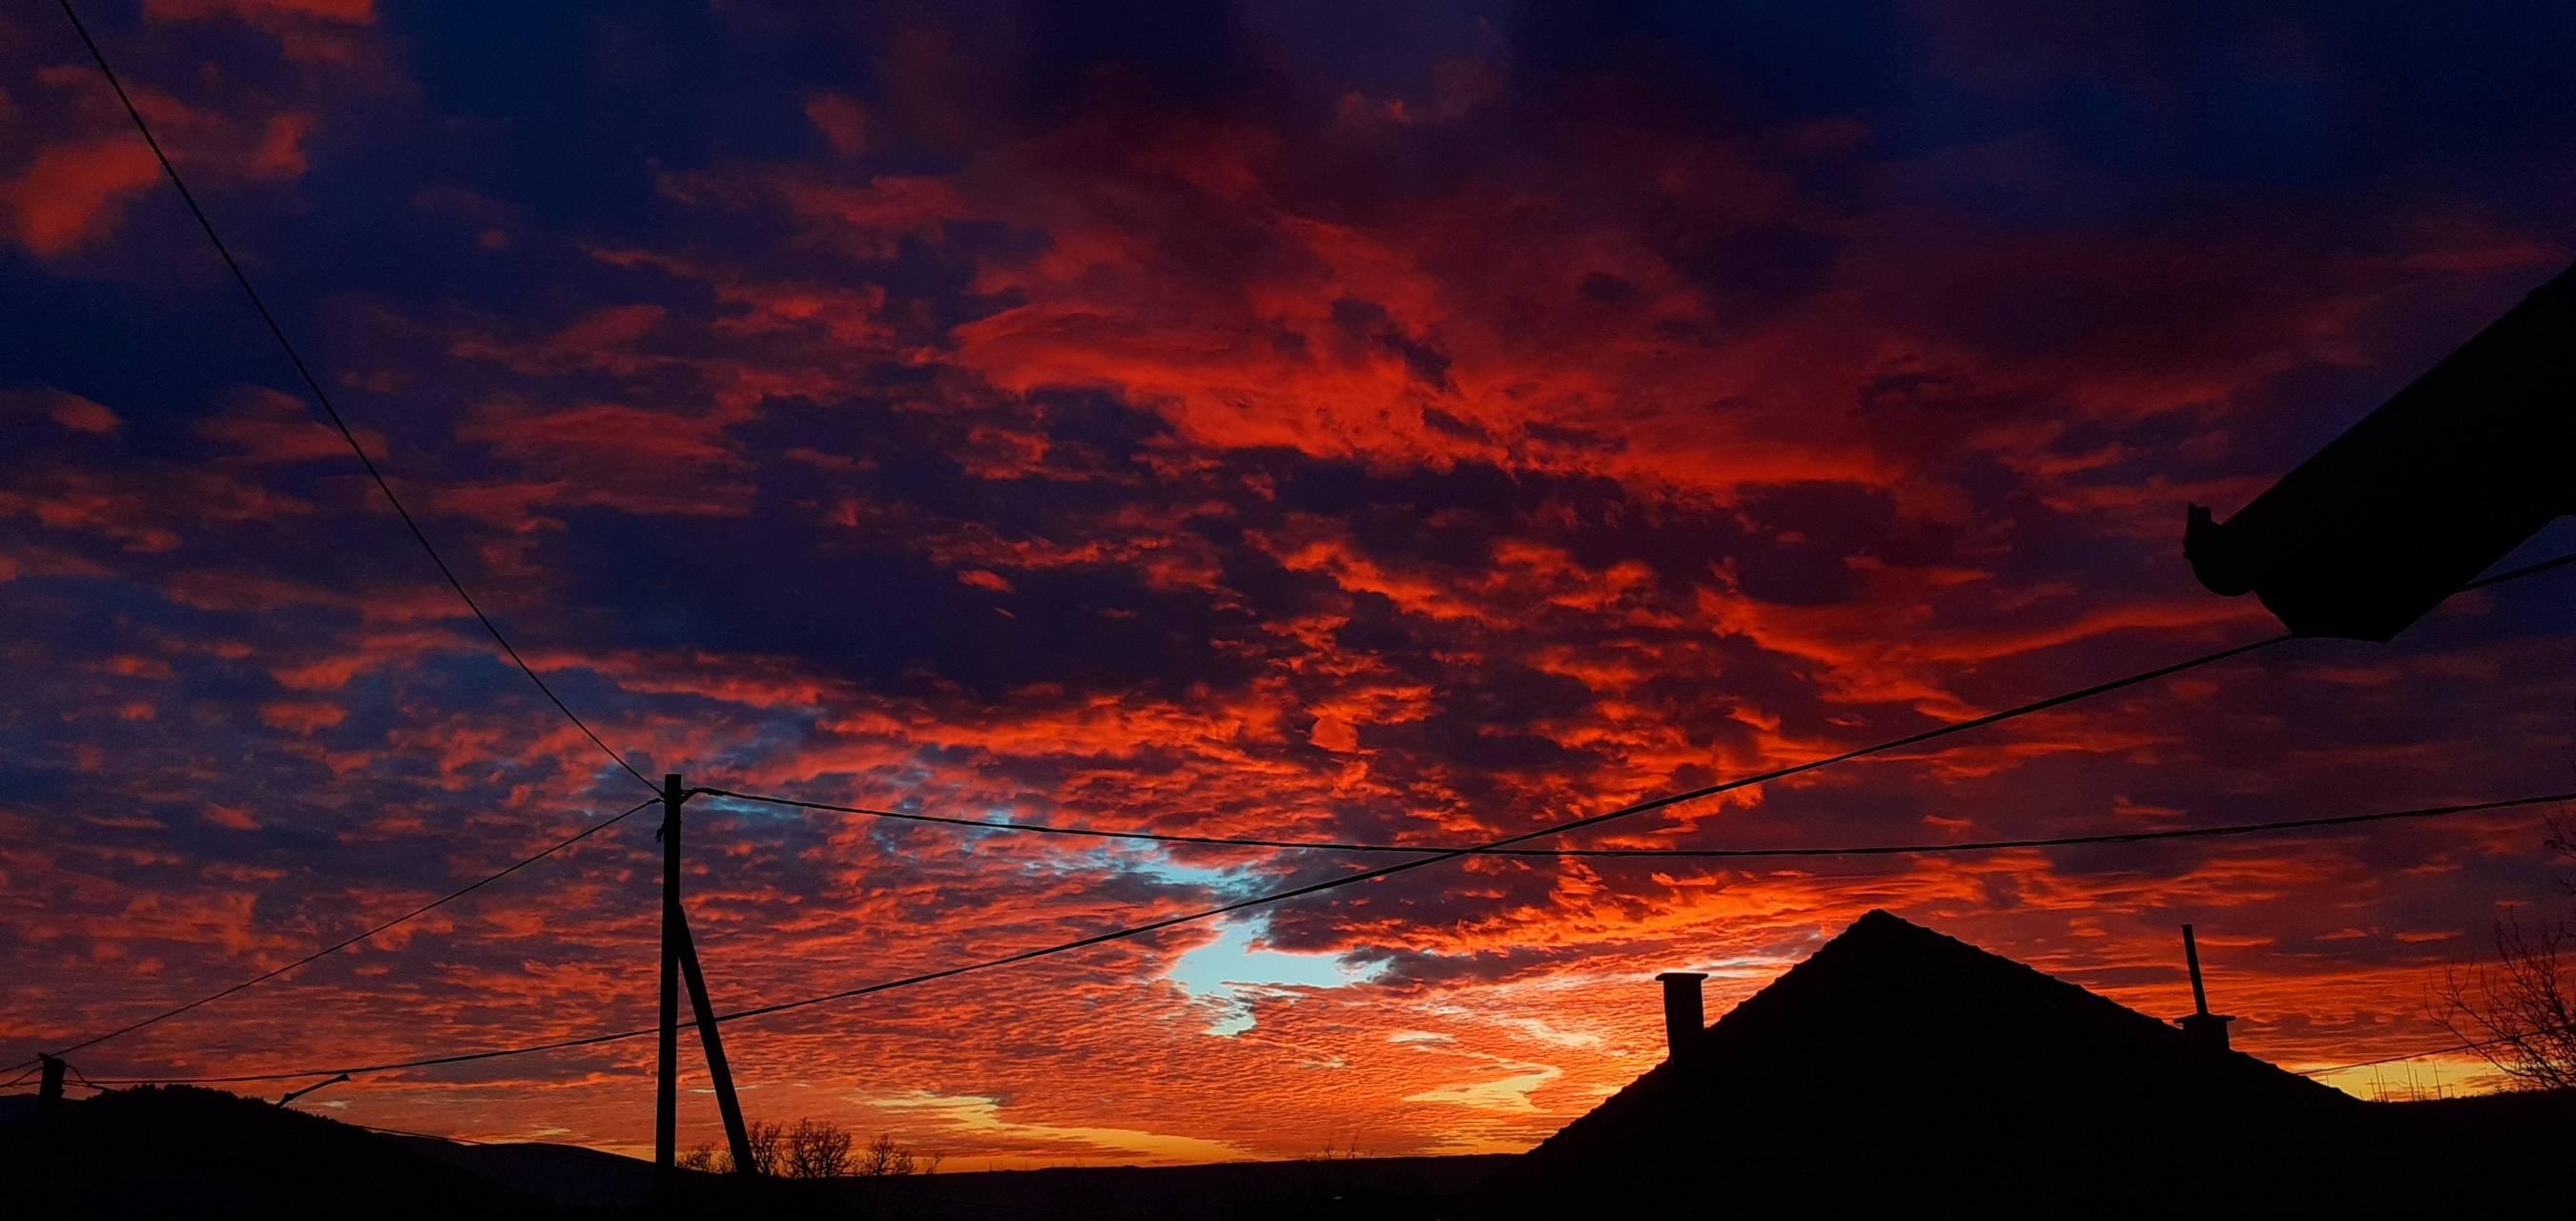 Firely sky